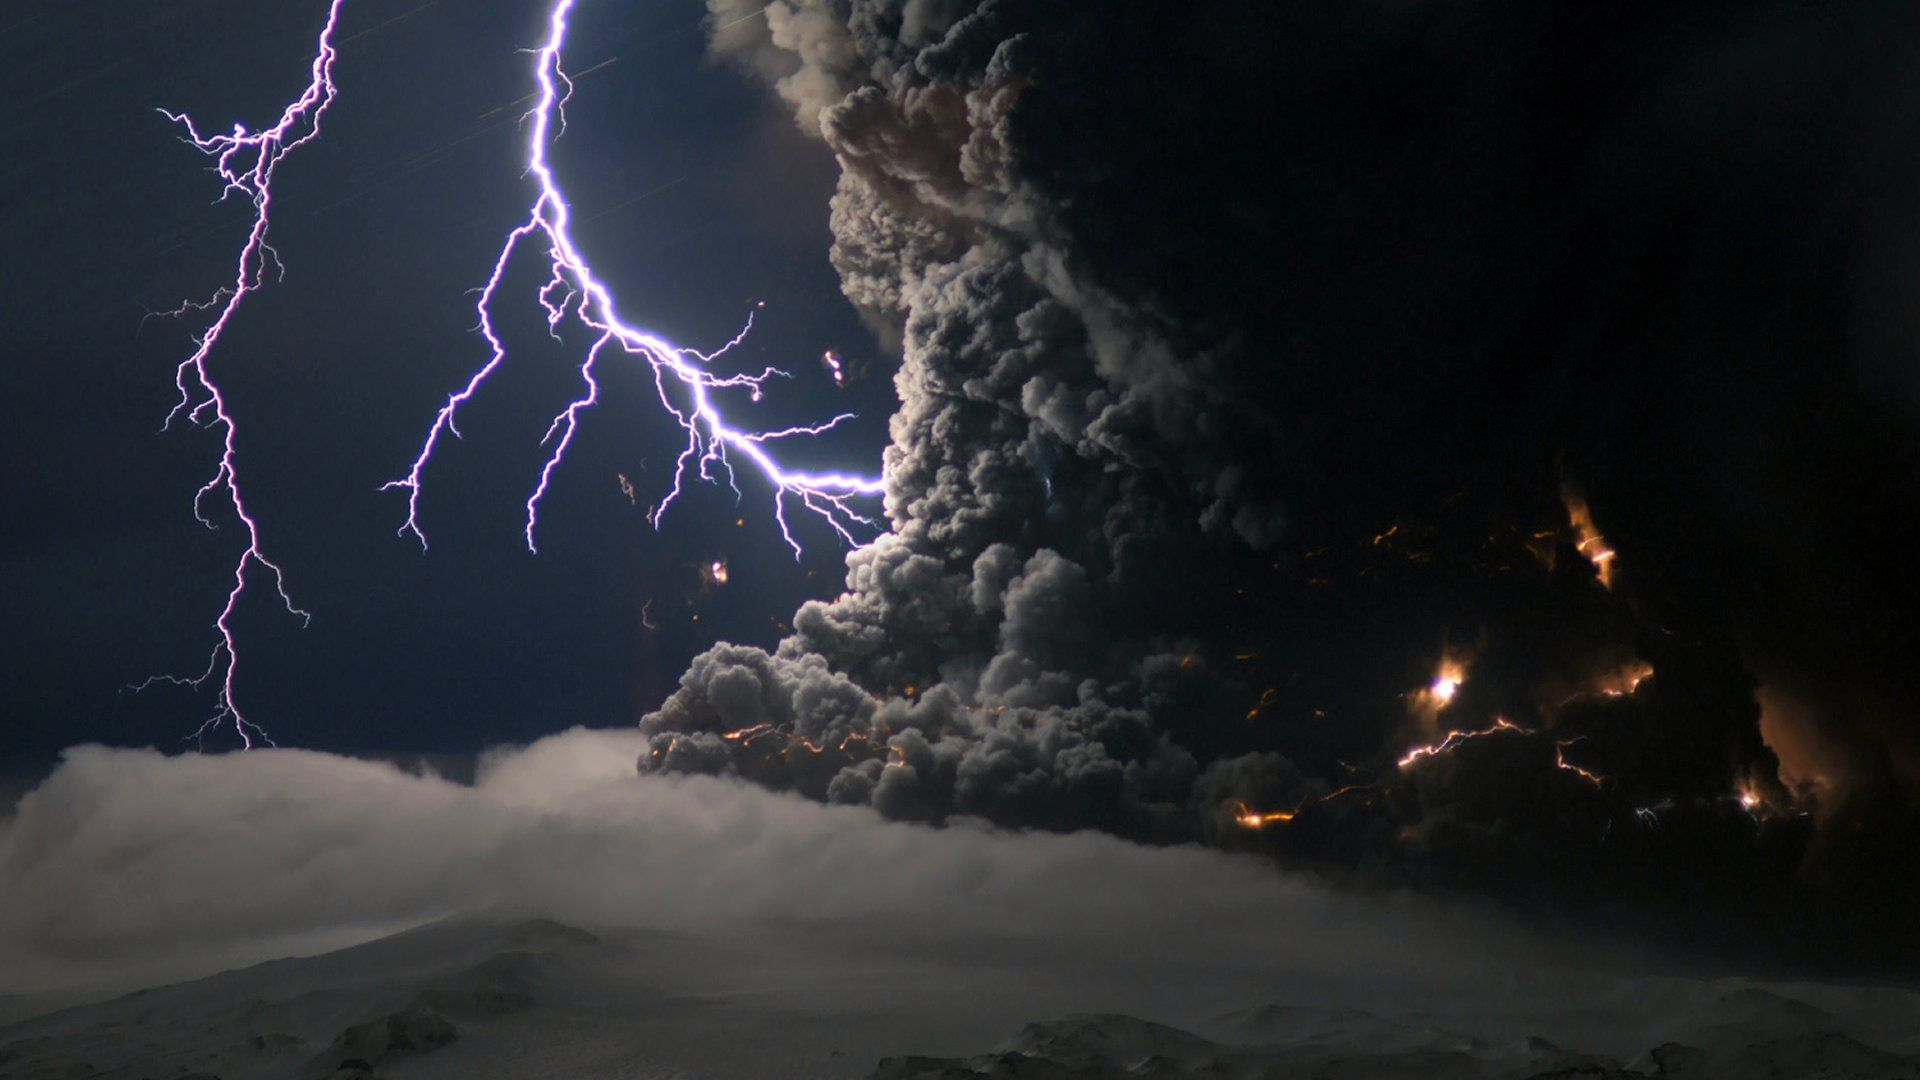 Lightning Bolt screen wallpaper